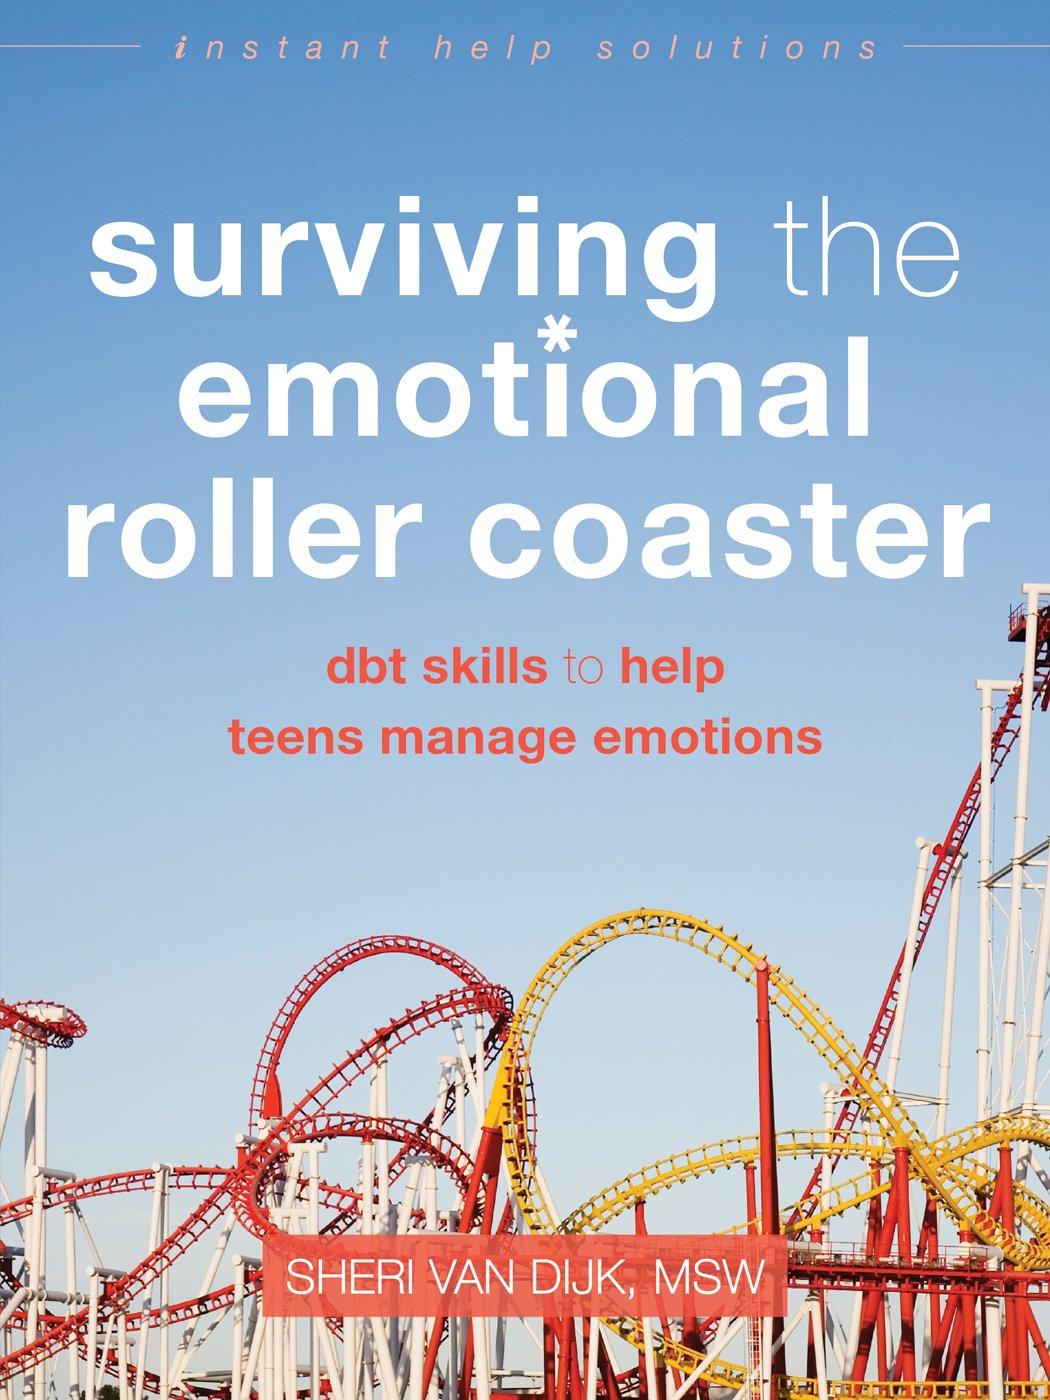 amazon com surviving the emotional roller coaster dbt skills to rh amazon com emotional rollercoaster meaning emotional rollercoaster meaning